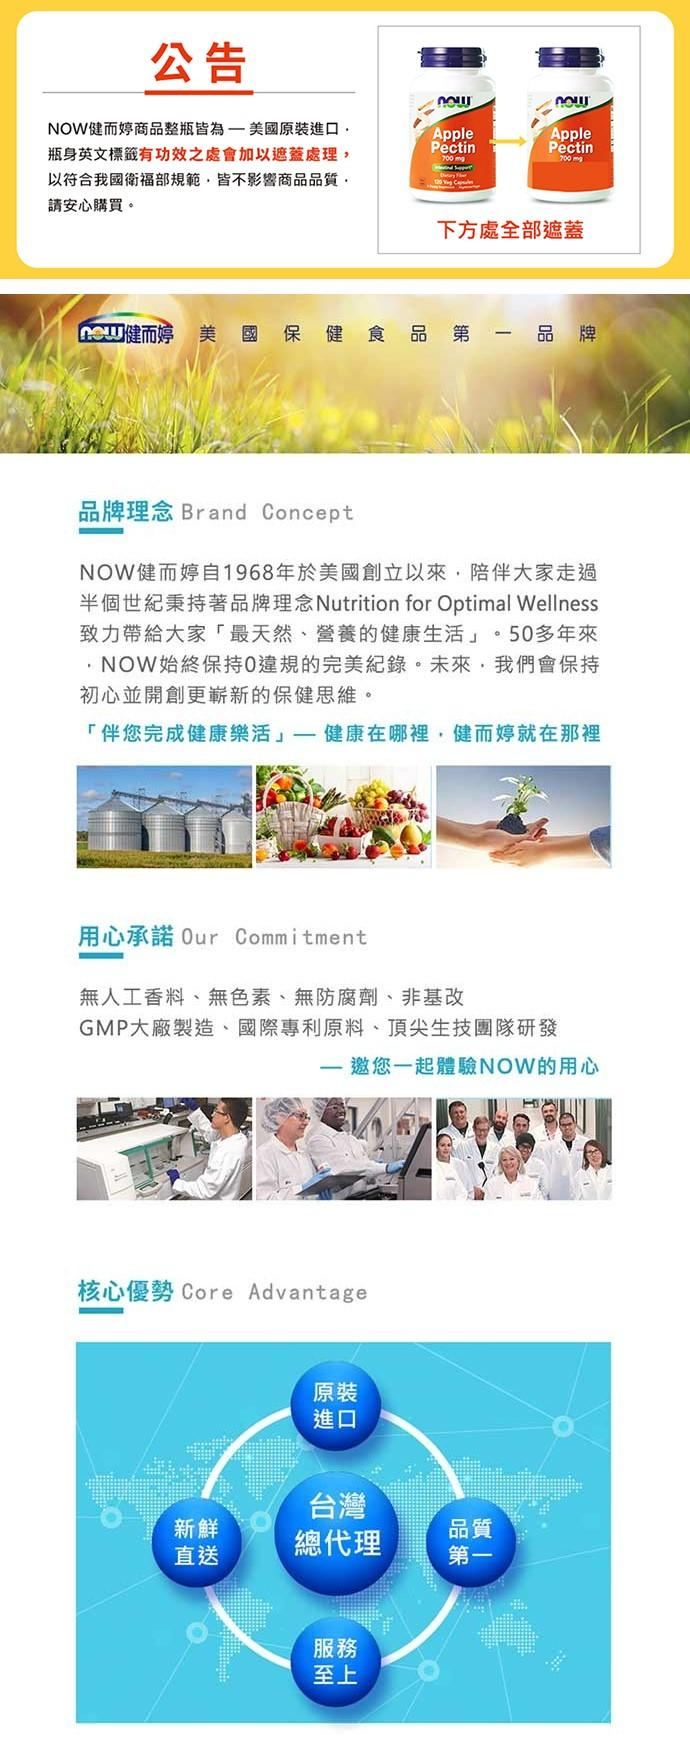 NOW健而婷-CLA紅花籽油(90顆)3瓶優惠組產品資訊